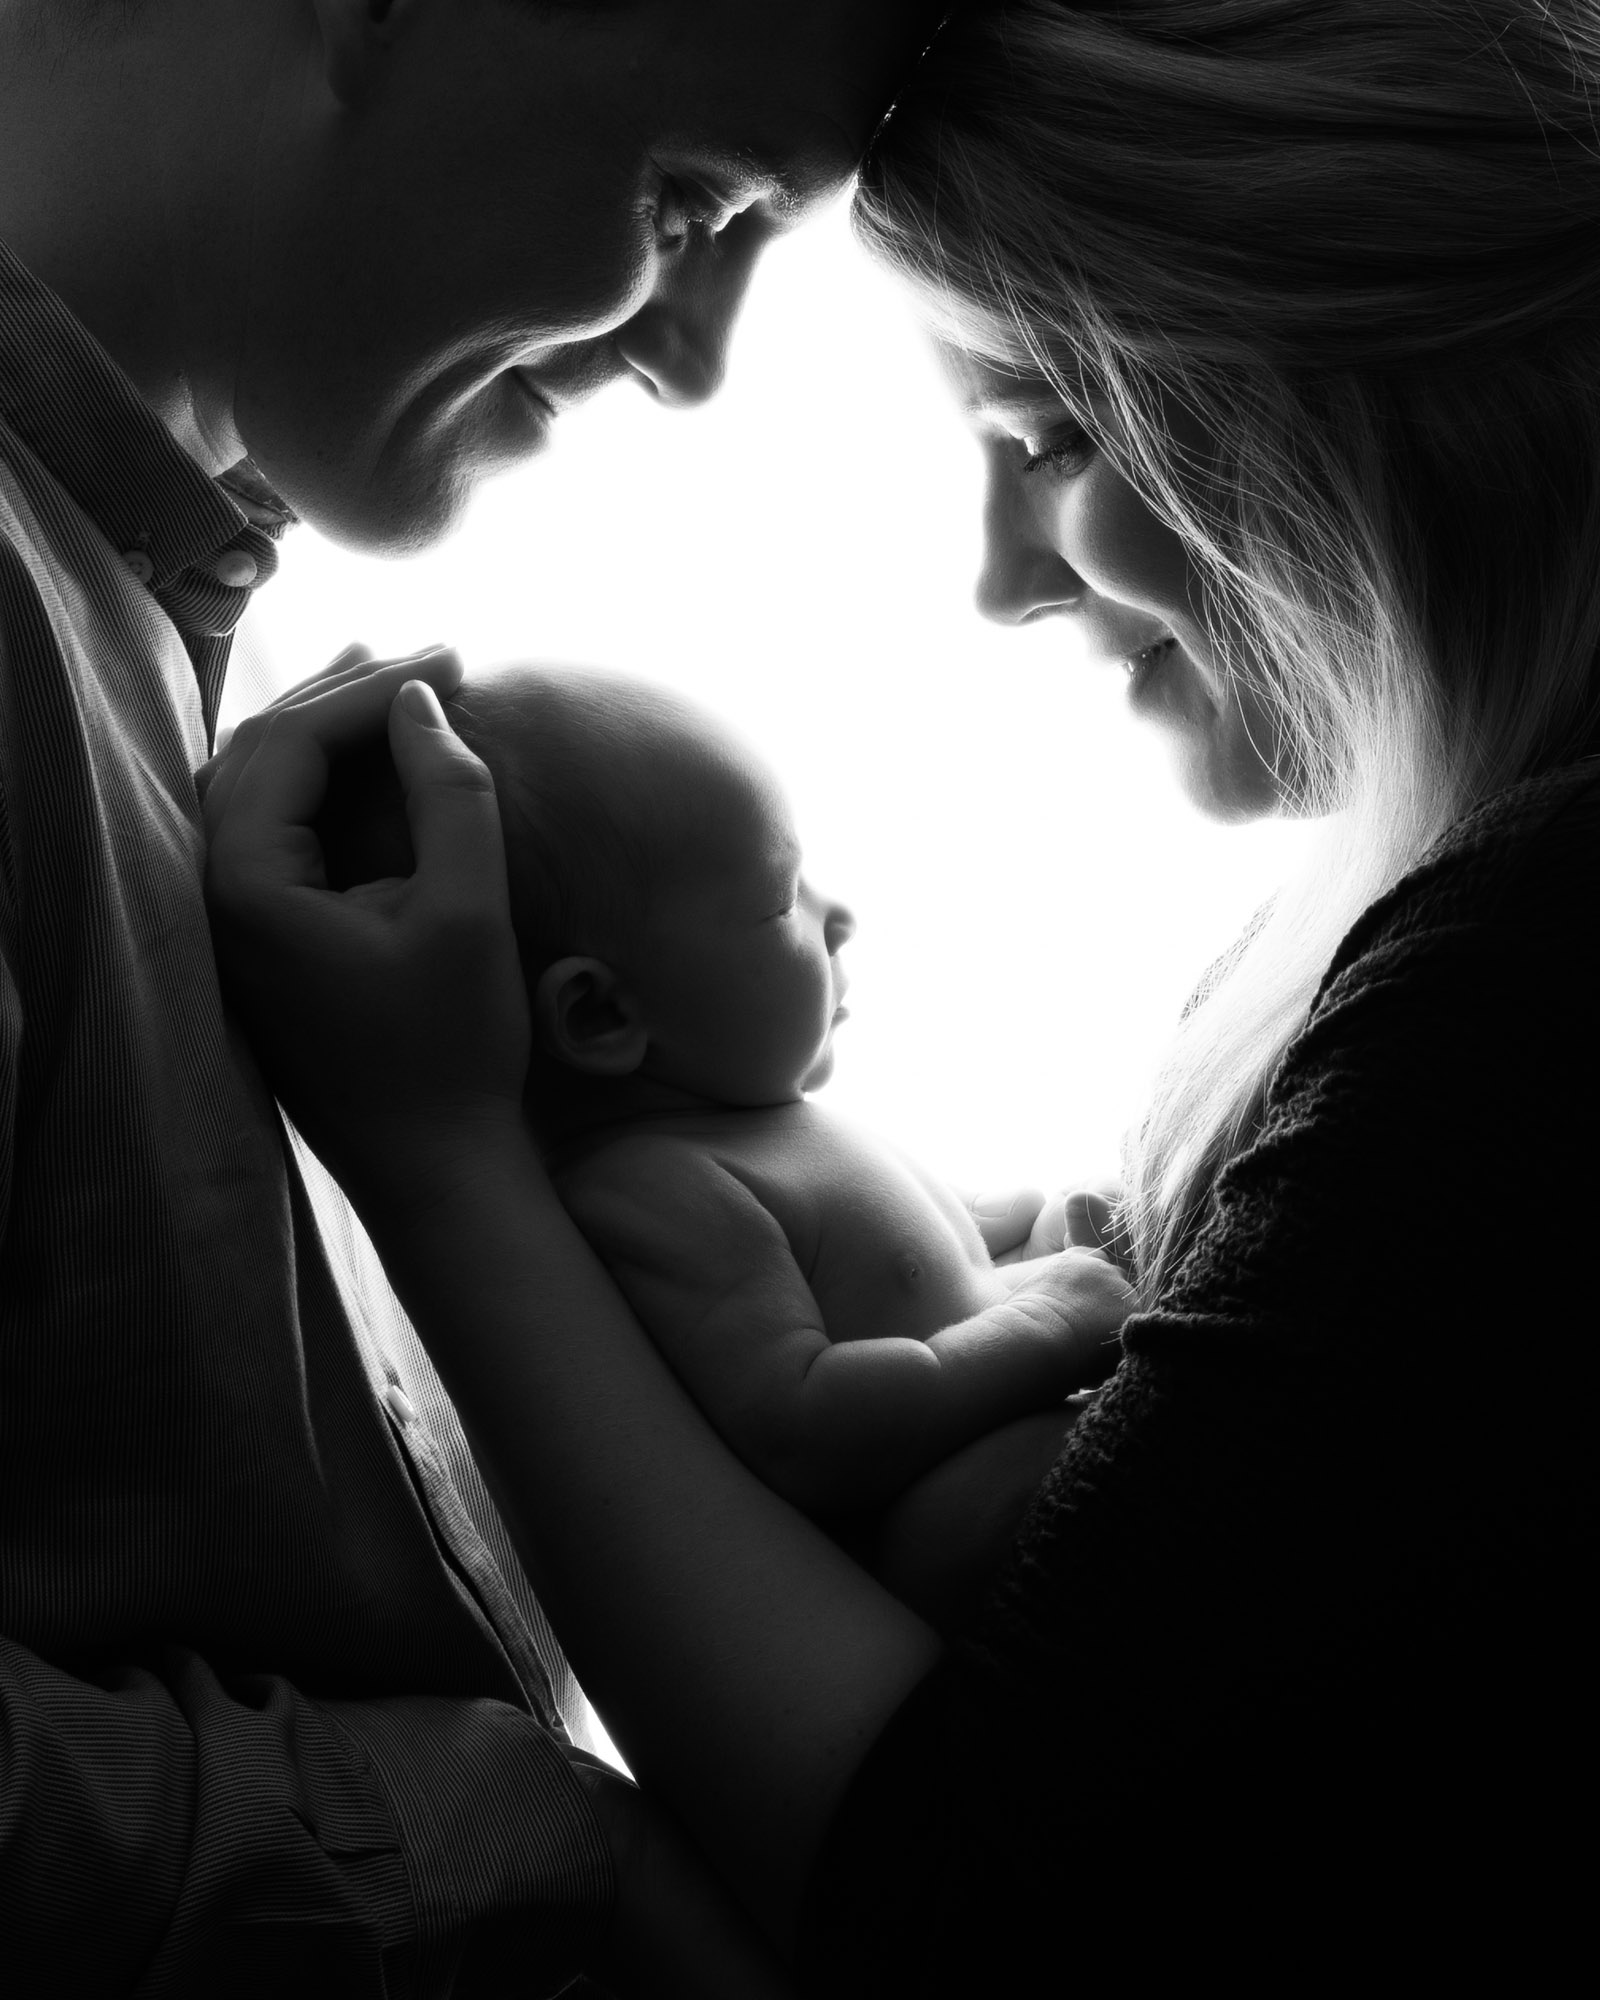 Newborn_baby_photographer_dudley_midlands_posing_with_parent